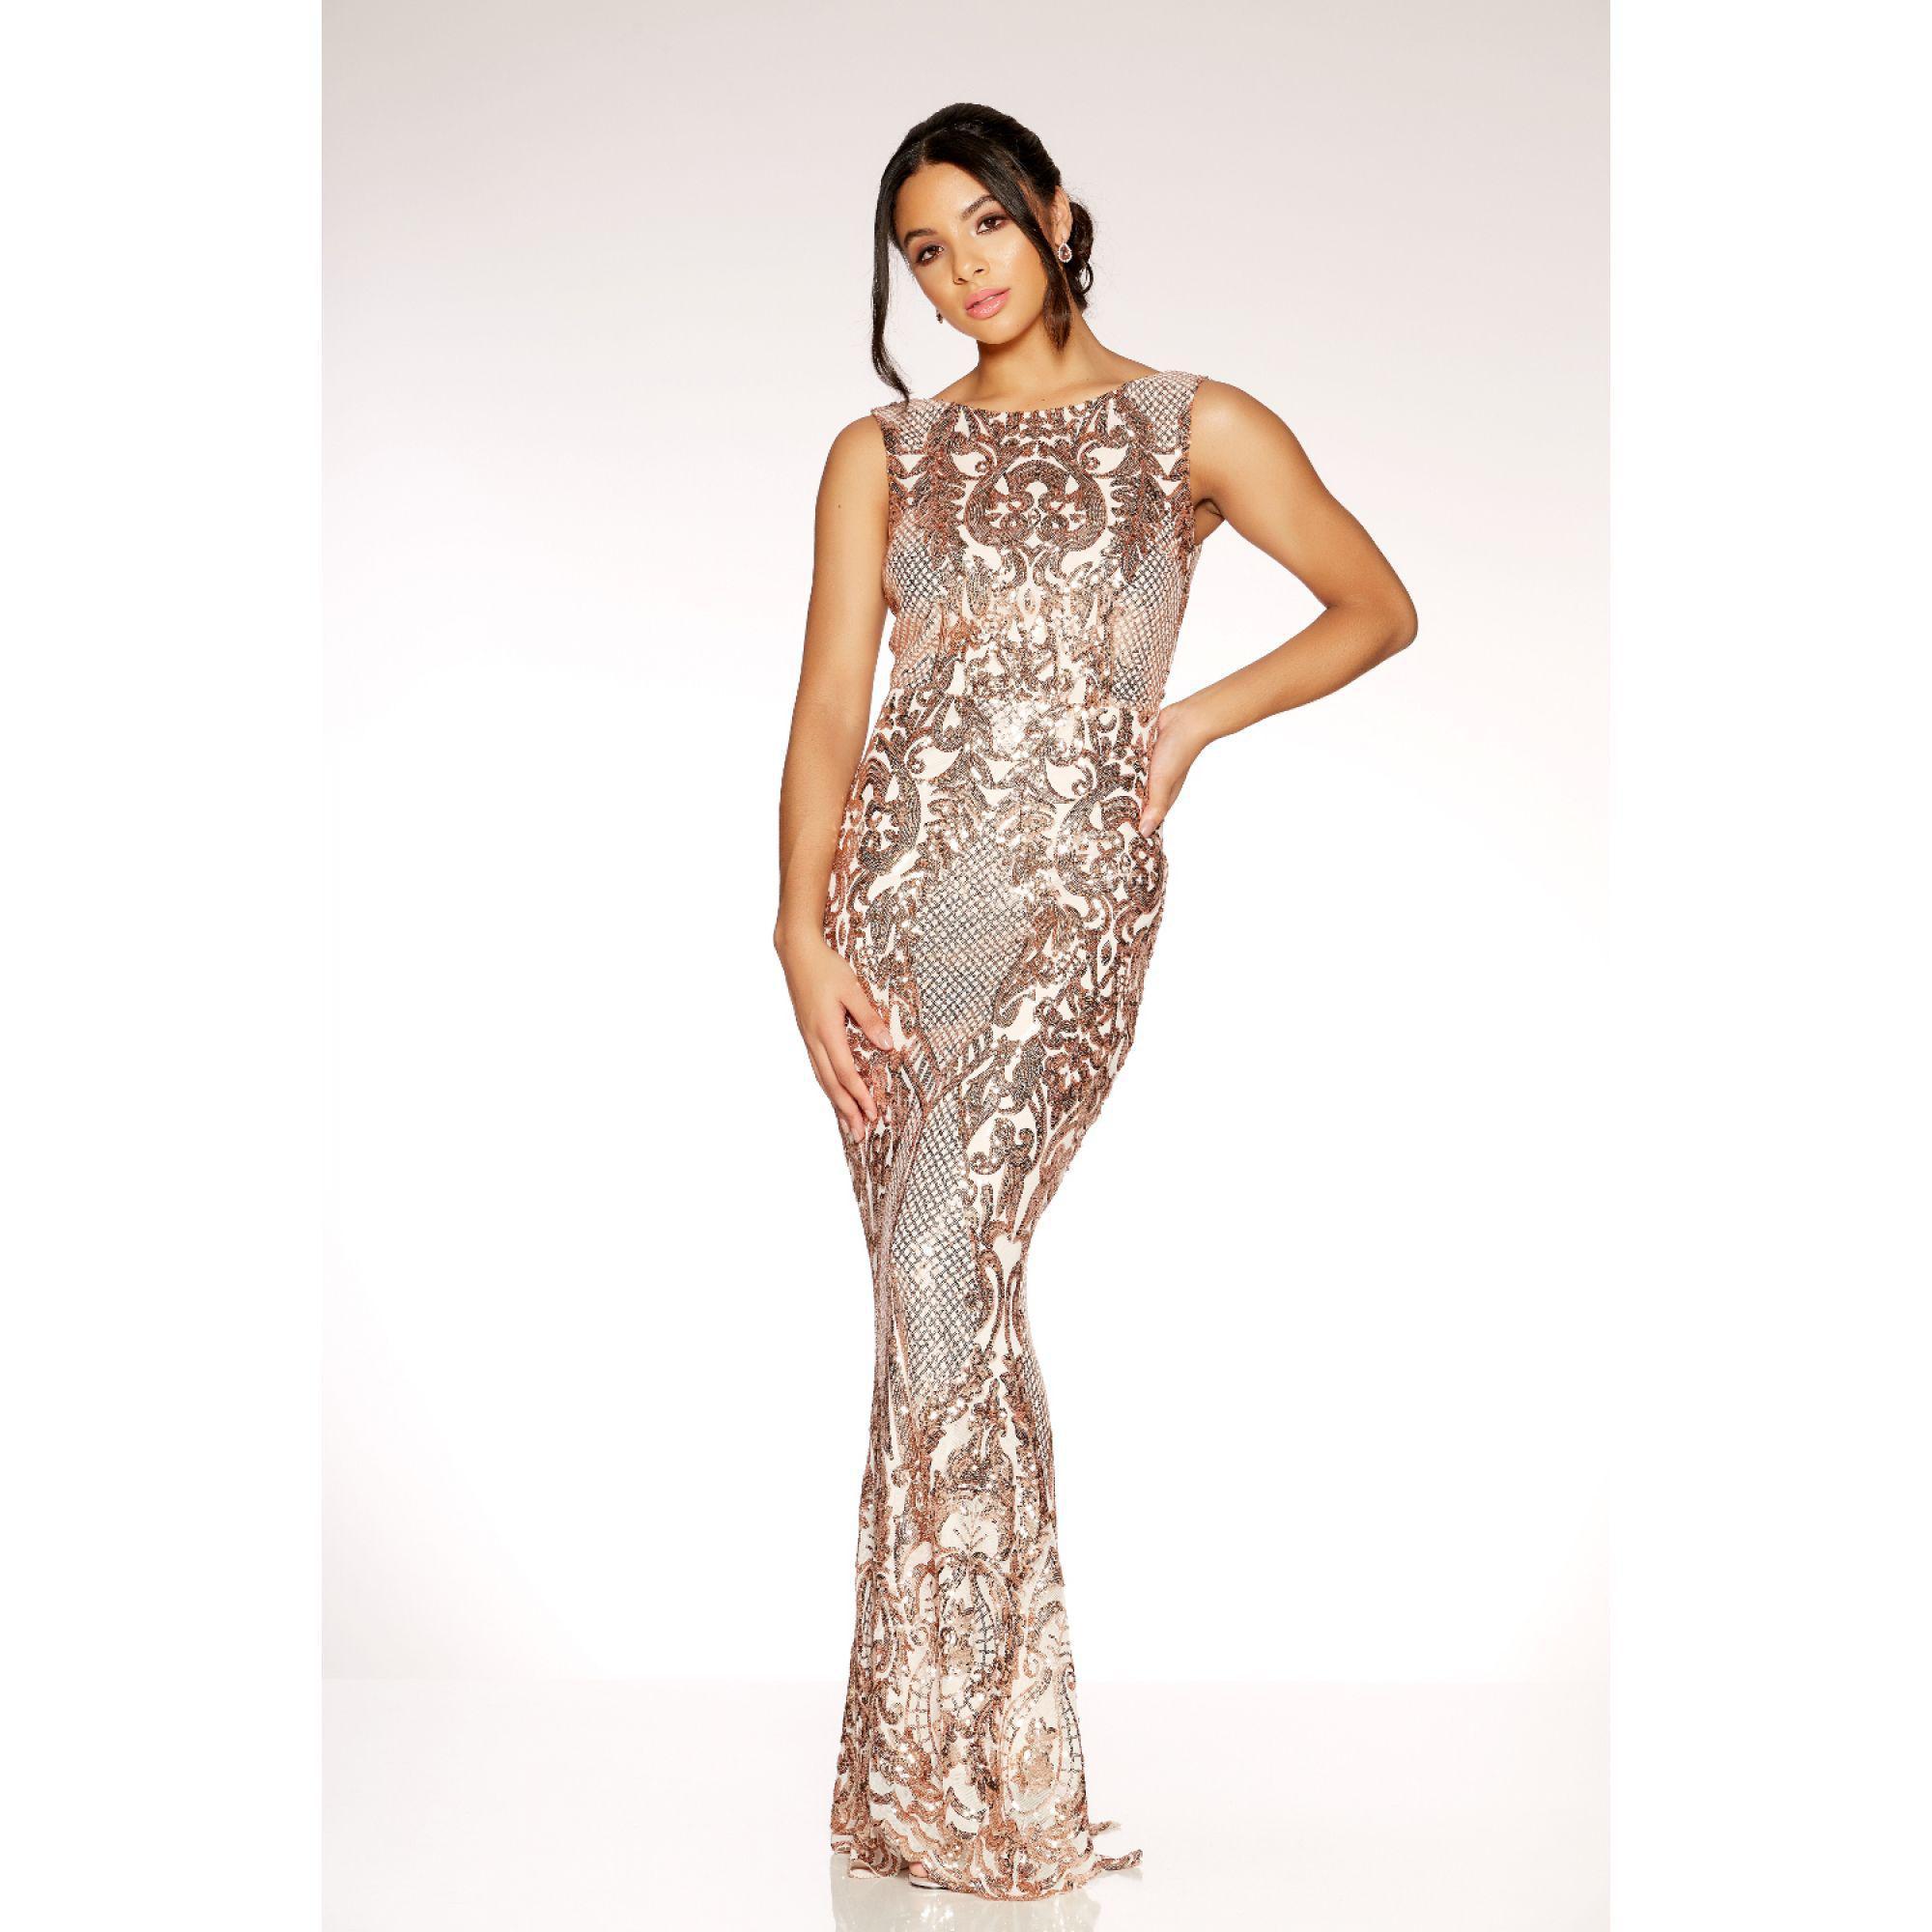 d01950c8cb2 Black And Gold Sequin High Neck Fishtail Maxi Dress - Data Dynamic AG